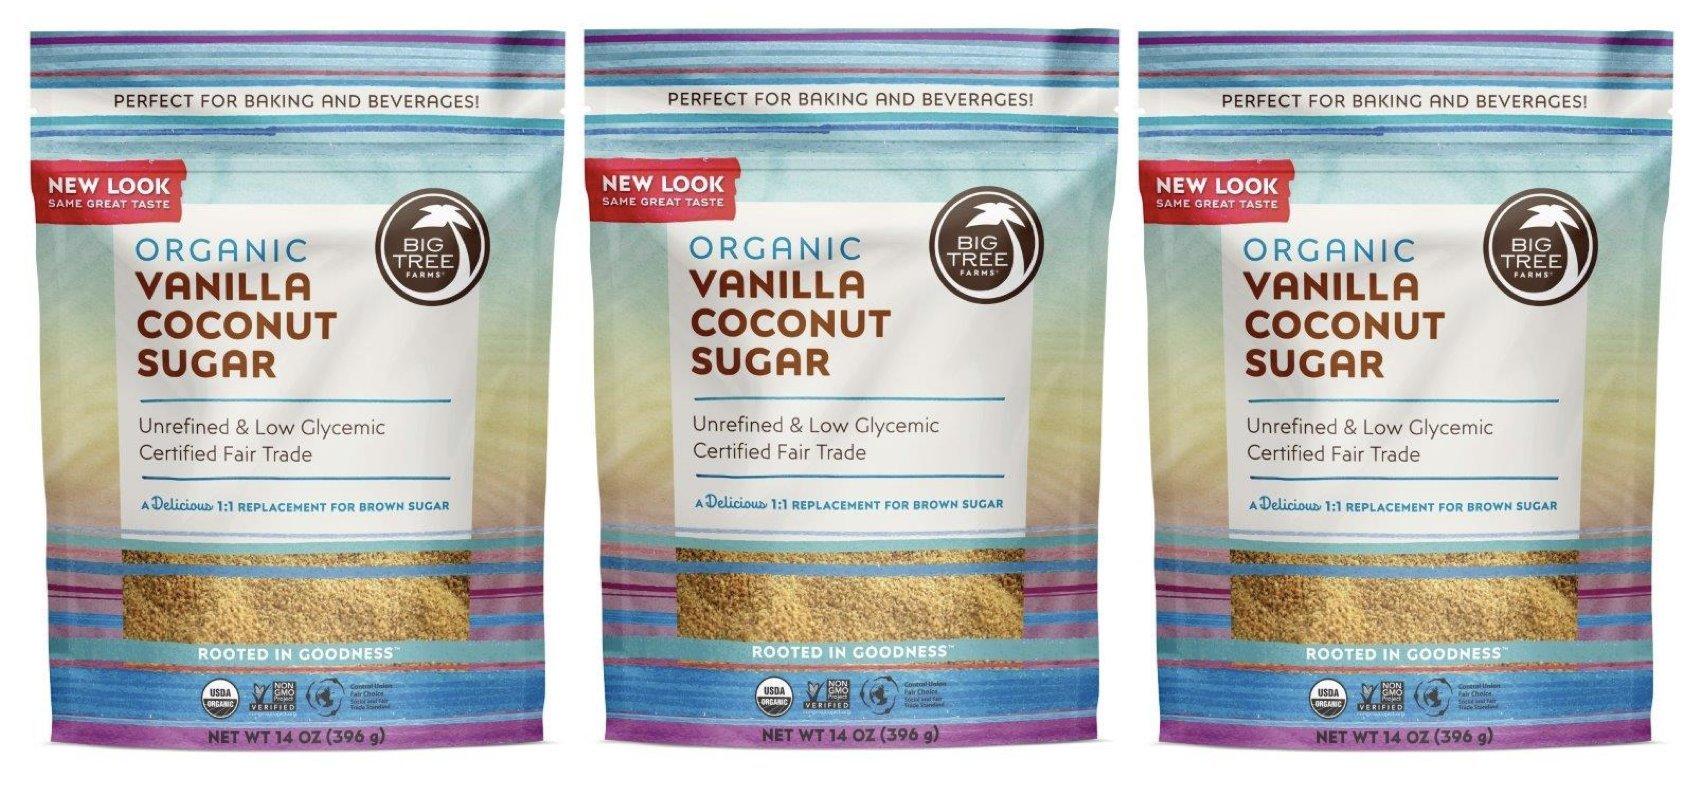 Big Tree Farms Organic Vanilla Coconut Sugar, Non-GMO, Gluten Free, Vegan, Fair Trade, Natural Sweetener, 14 Ounce (Pack of 3) (Packaging May Vary)